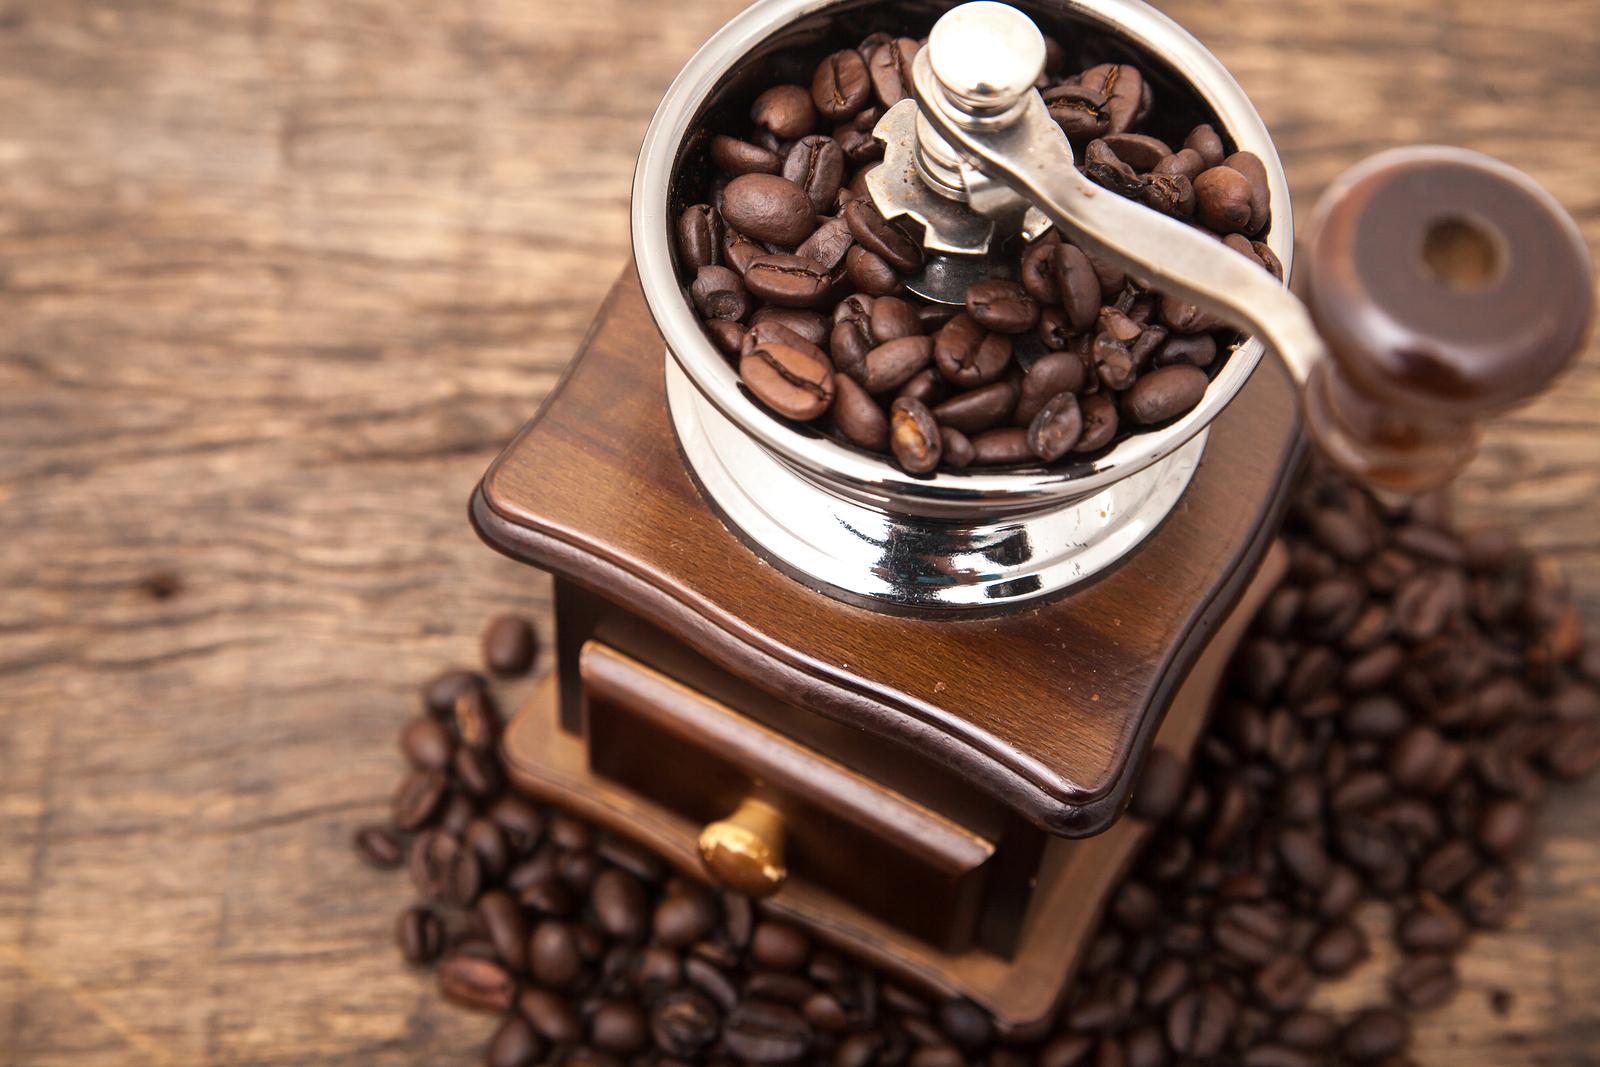 bigstock-Close-Up-Fresh-Coffee-Bean-In--67713217.jpg